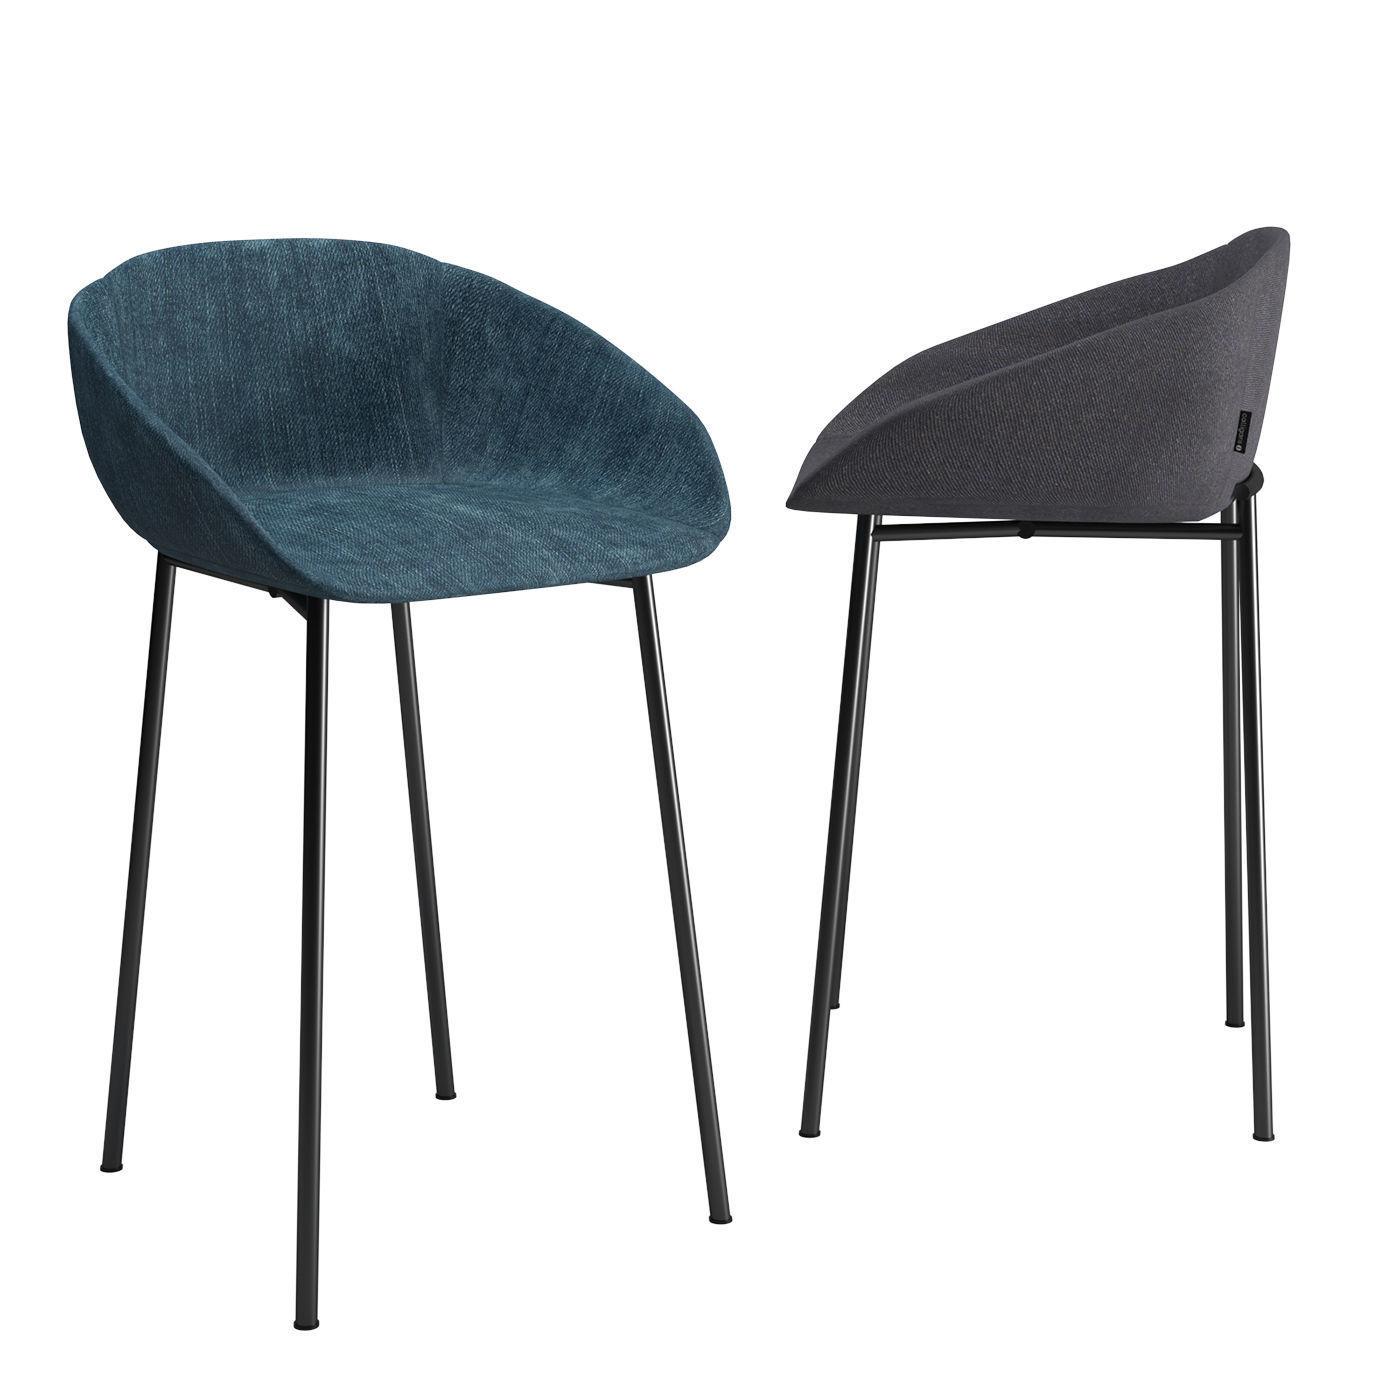 Calligaris love stool